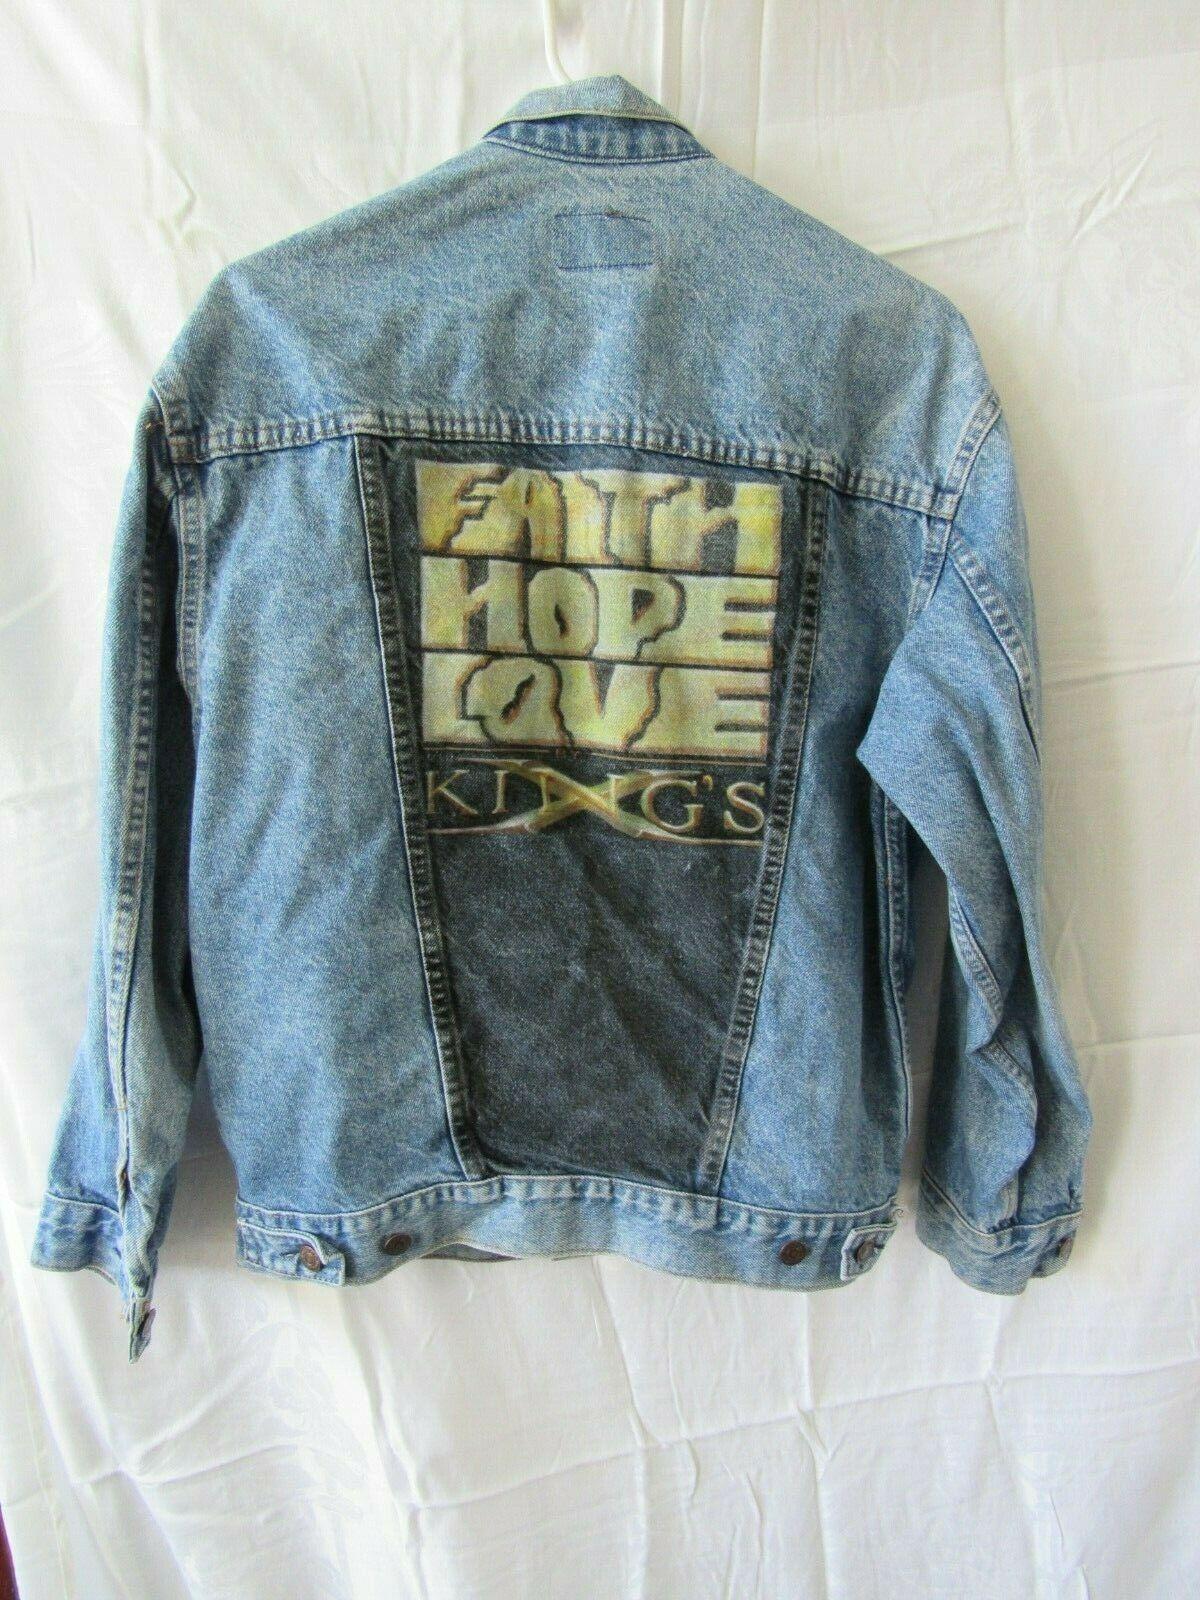 Faith Hope Love X Kings Vintage Jean Jacket Levi Strauss XL Rare Find - $54.56